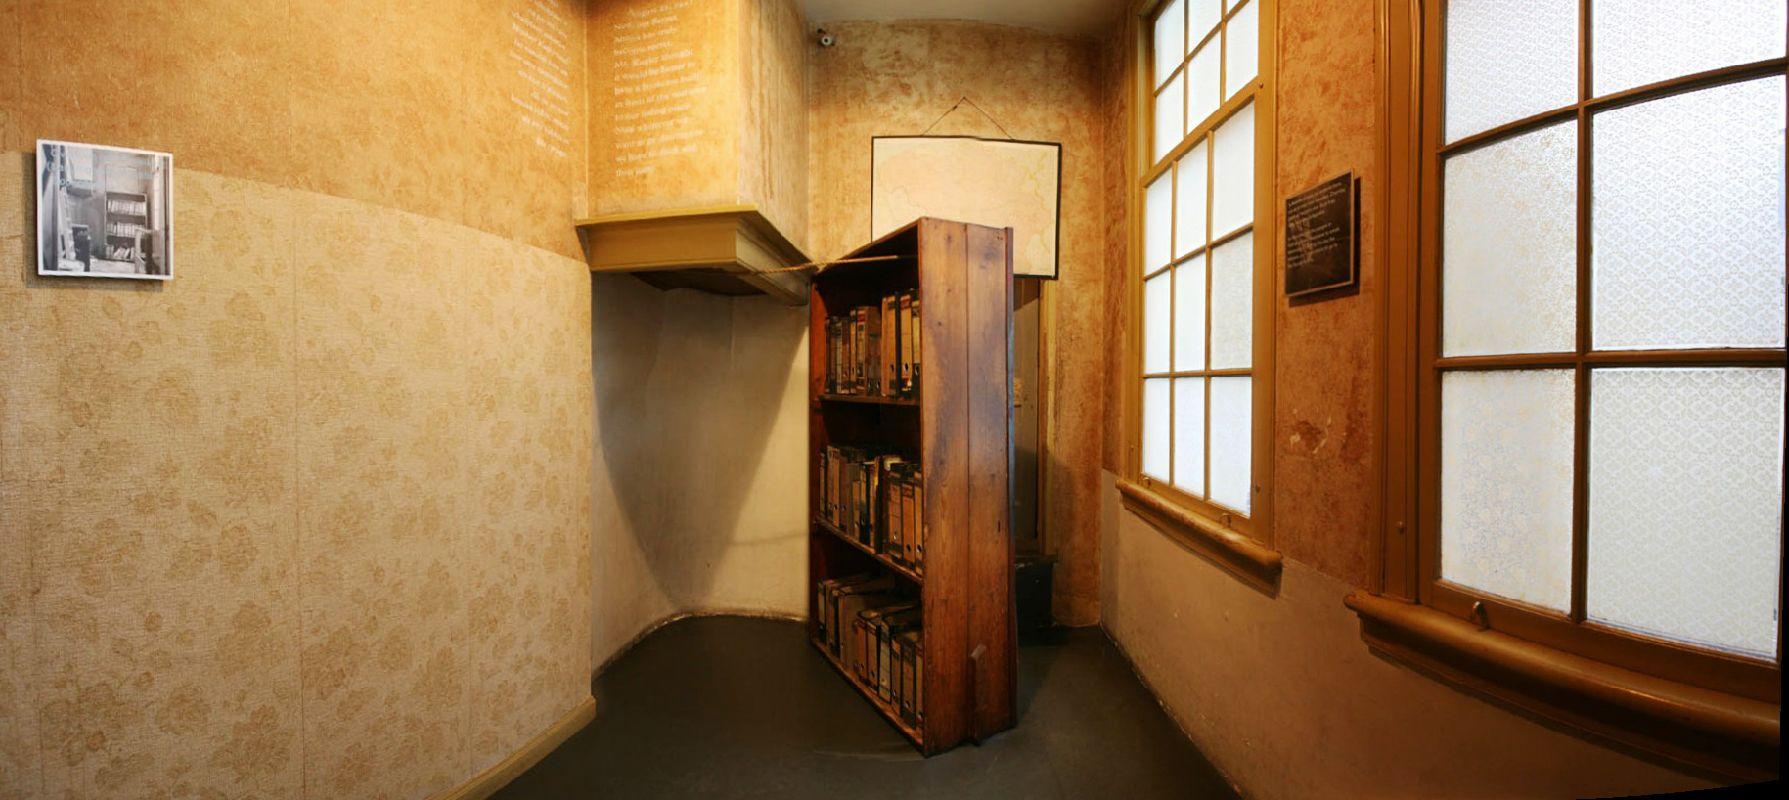 passage secret maison d 39 annec franck amsterdam inside secret pinterest secret doors. Black Bedroom Furniture Sets. Home Design Ideas